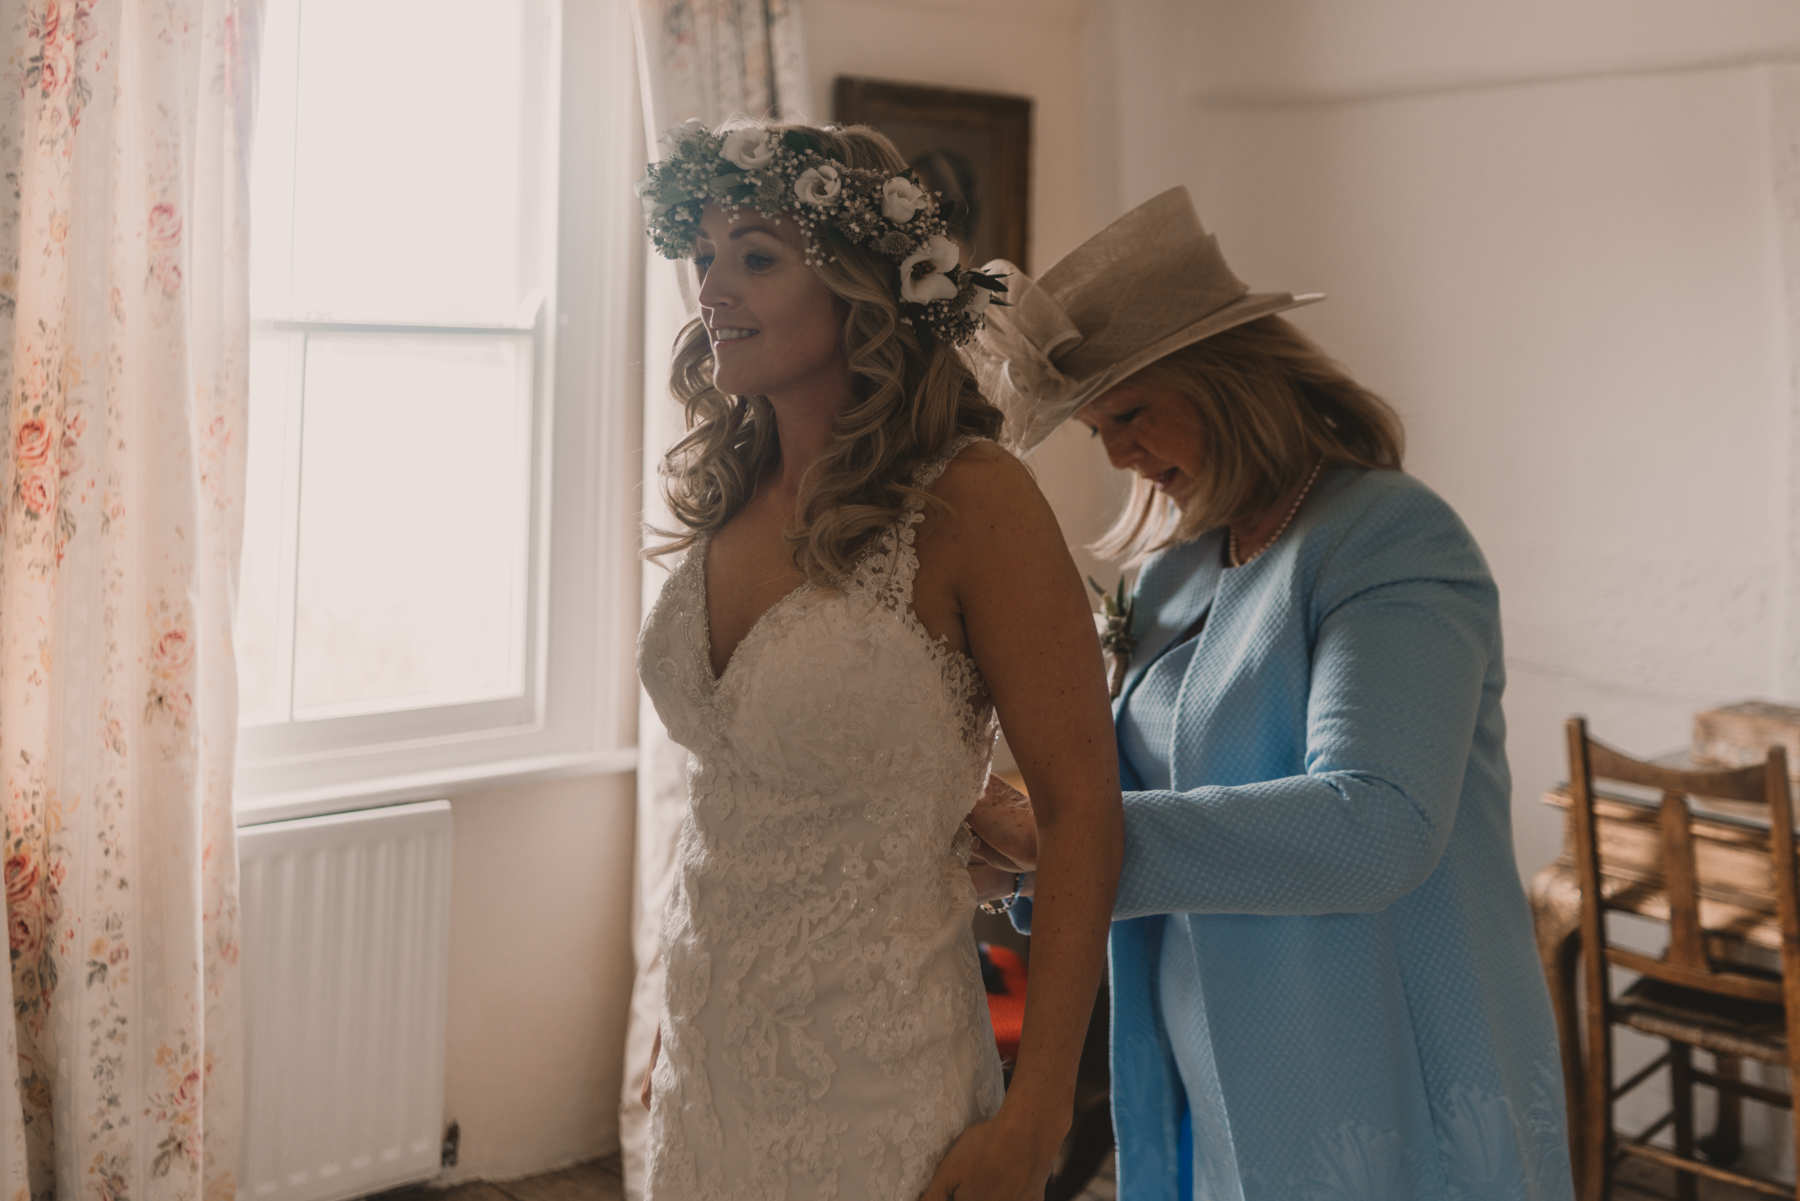 Herefordshire-barn-wedding-highlights-024.jpg